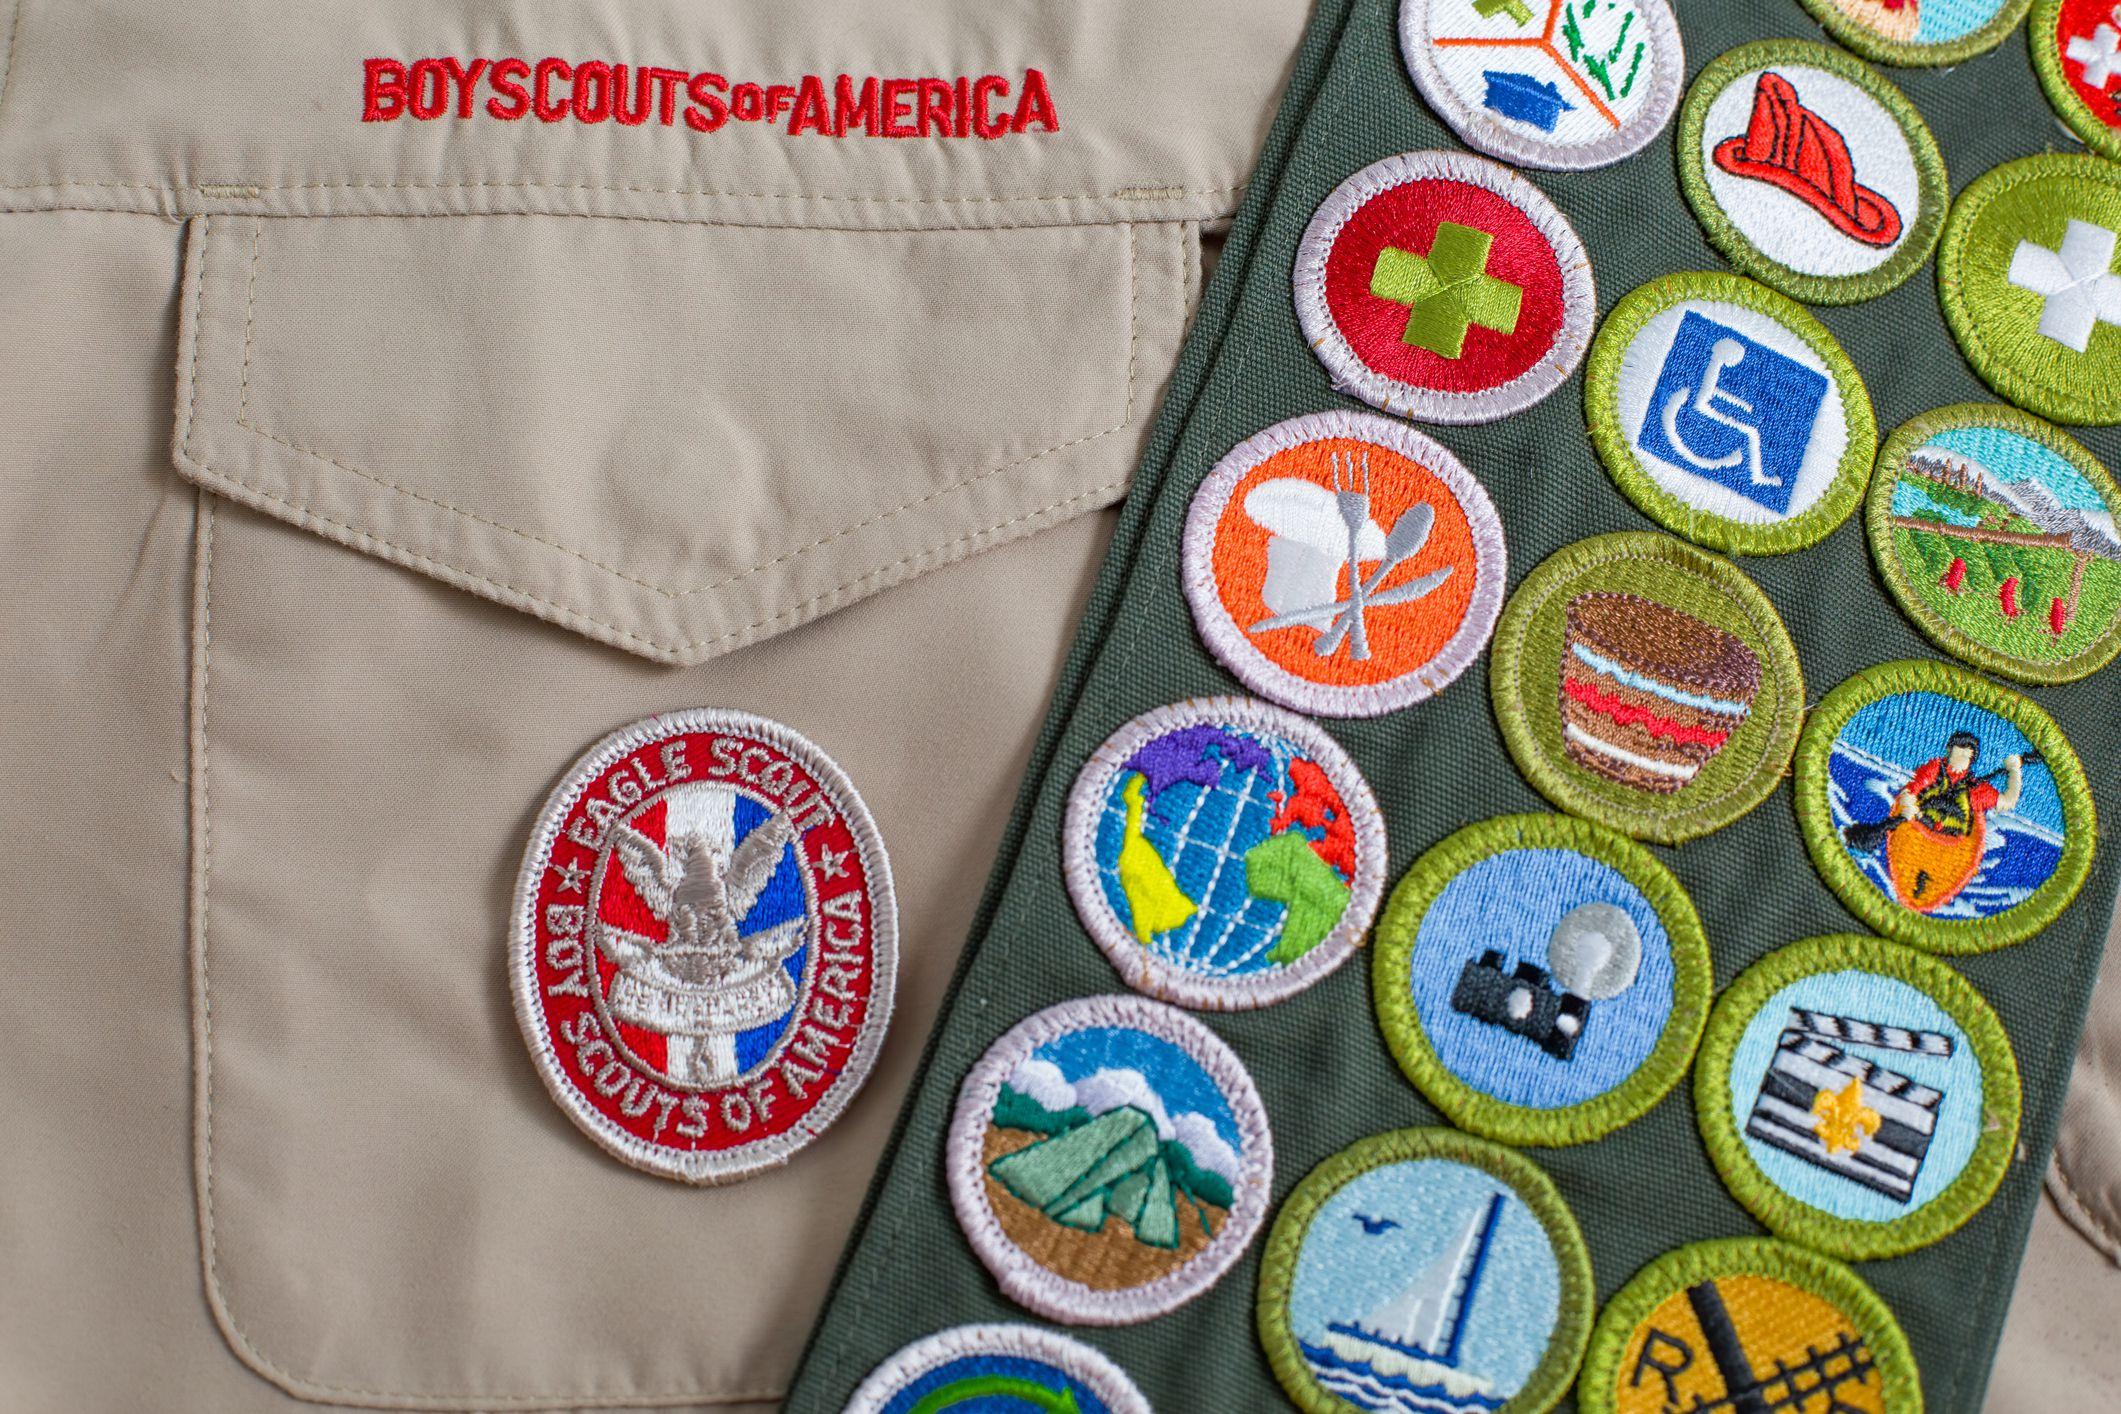 Insider Tips For Earning Boy Scout Merit Badges